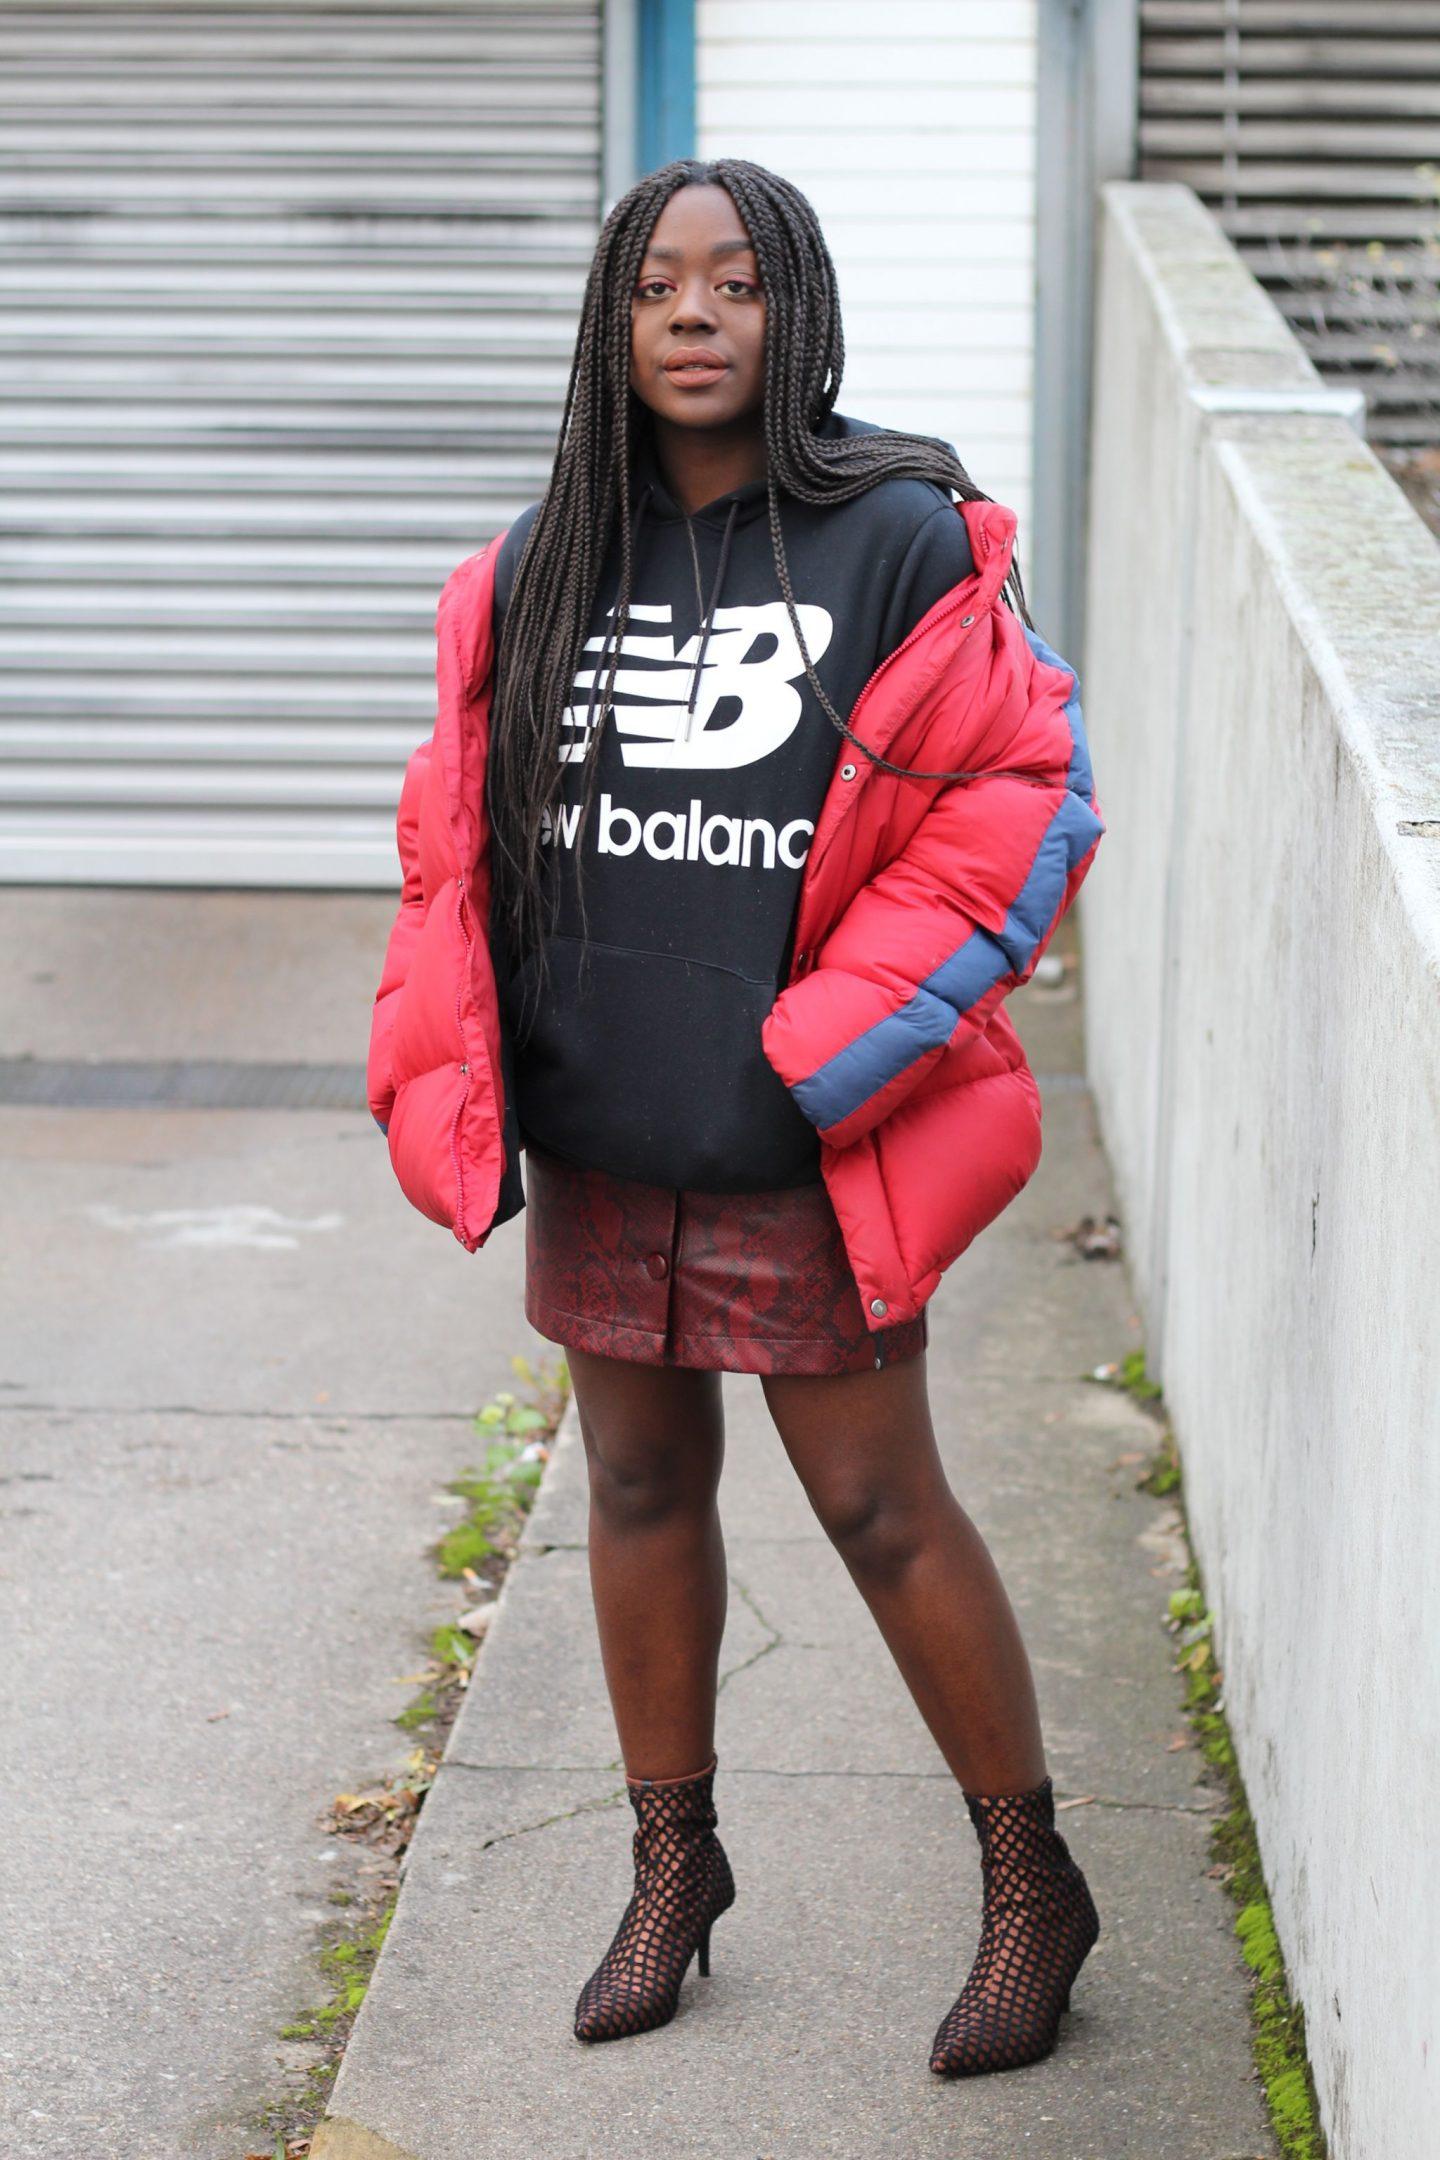 streetwear_chic_lois_opoku_fashion_blog_style_berlin_lisforlois_7